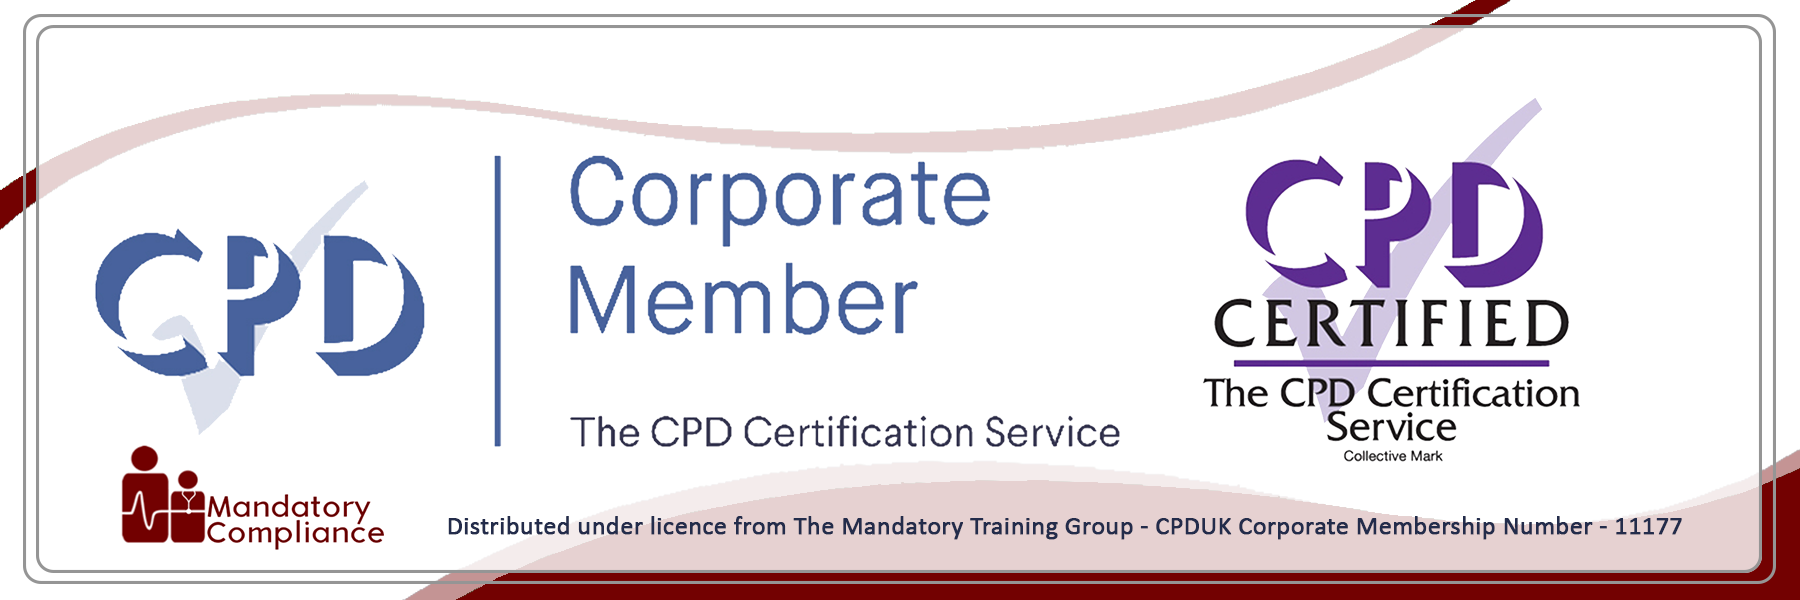 Online Health and Social Care Mandatory Training - E-Learning Courses - Mandatory Compliance UK -